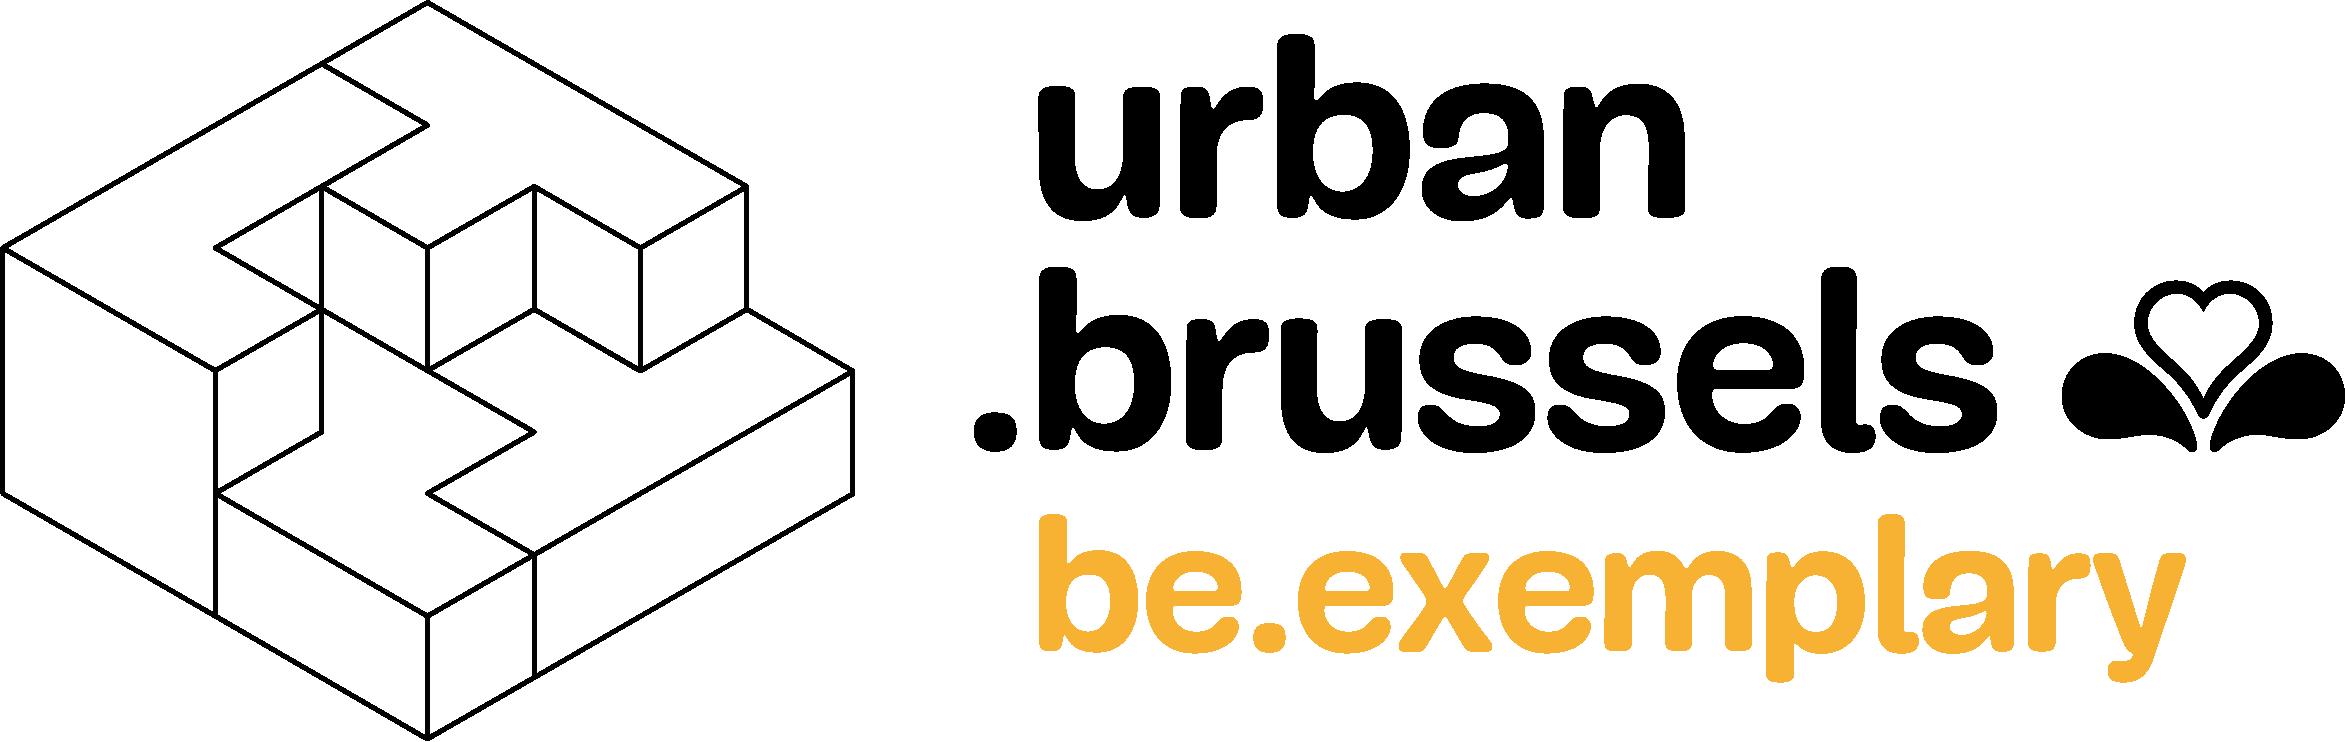 Be.exemplary